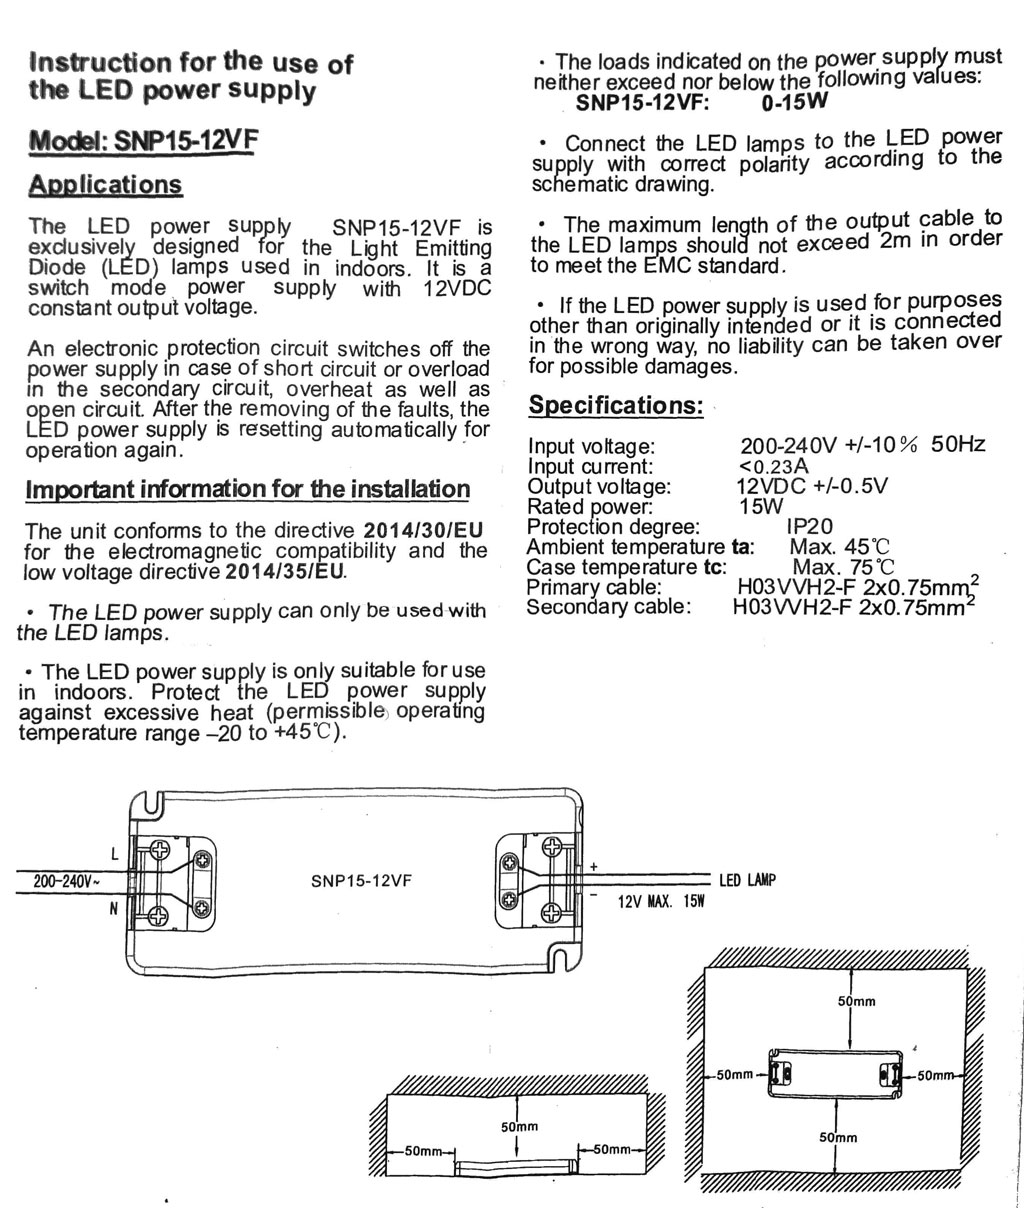 snp15-12vf-1.jpg